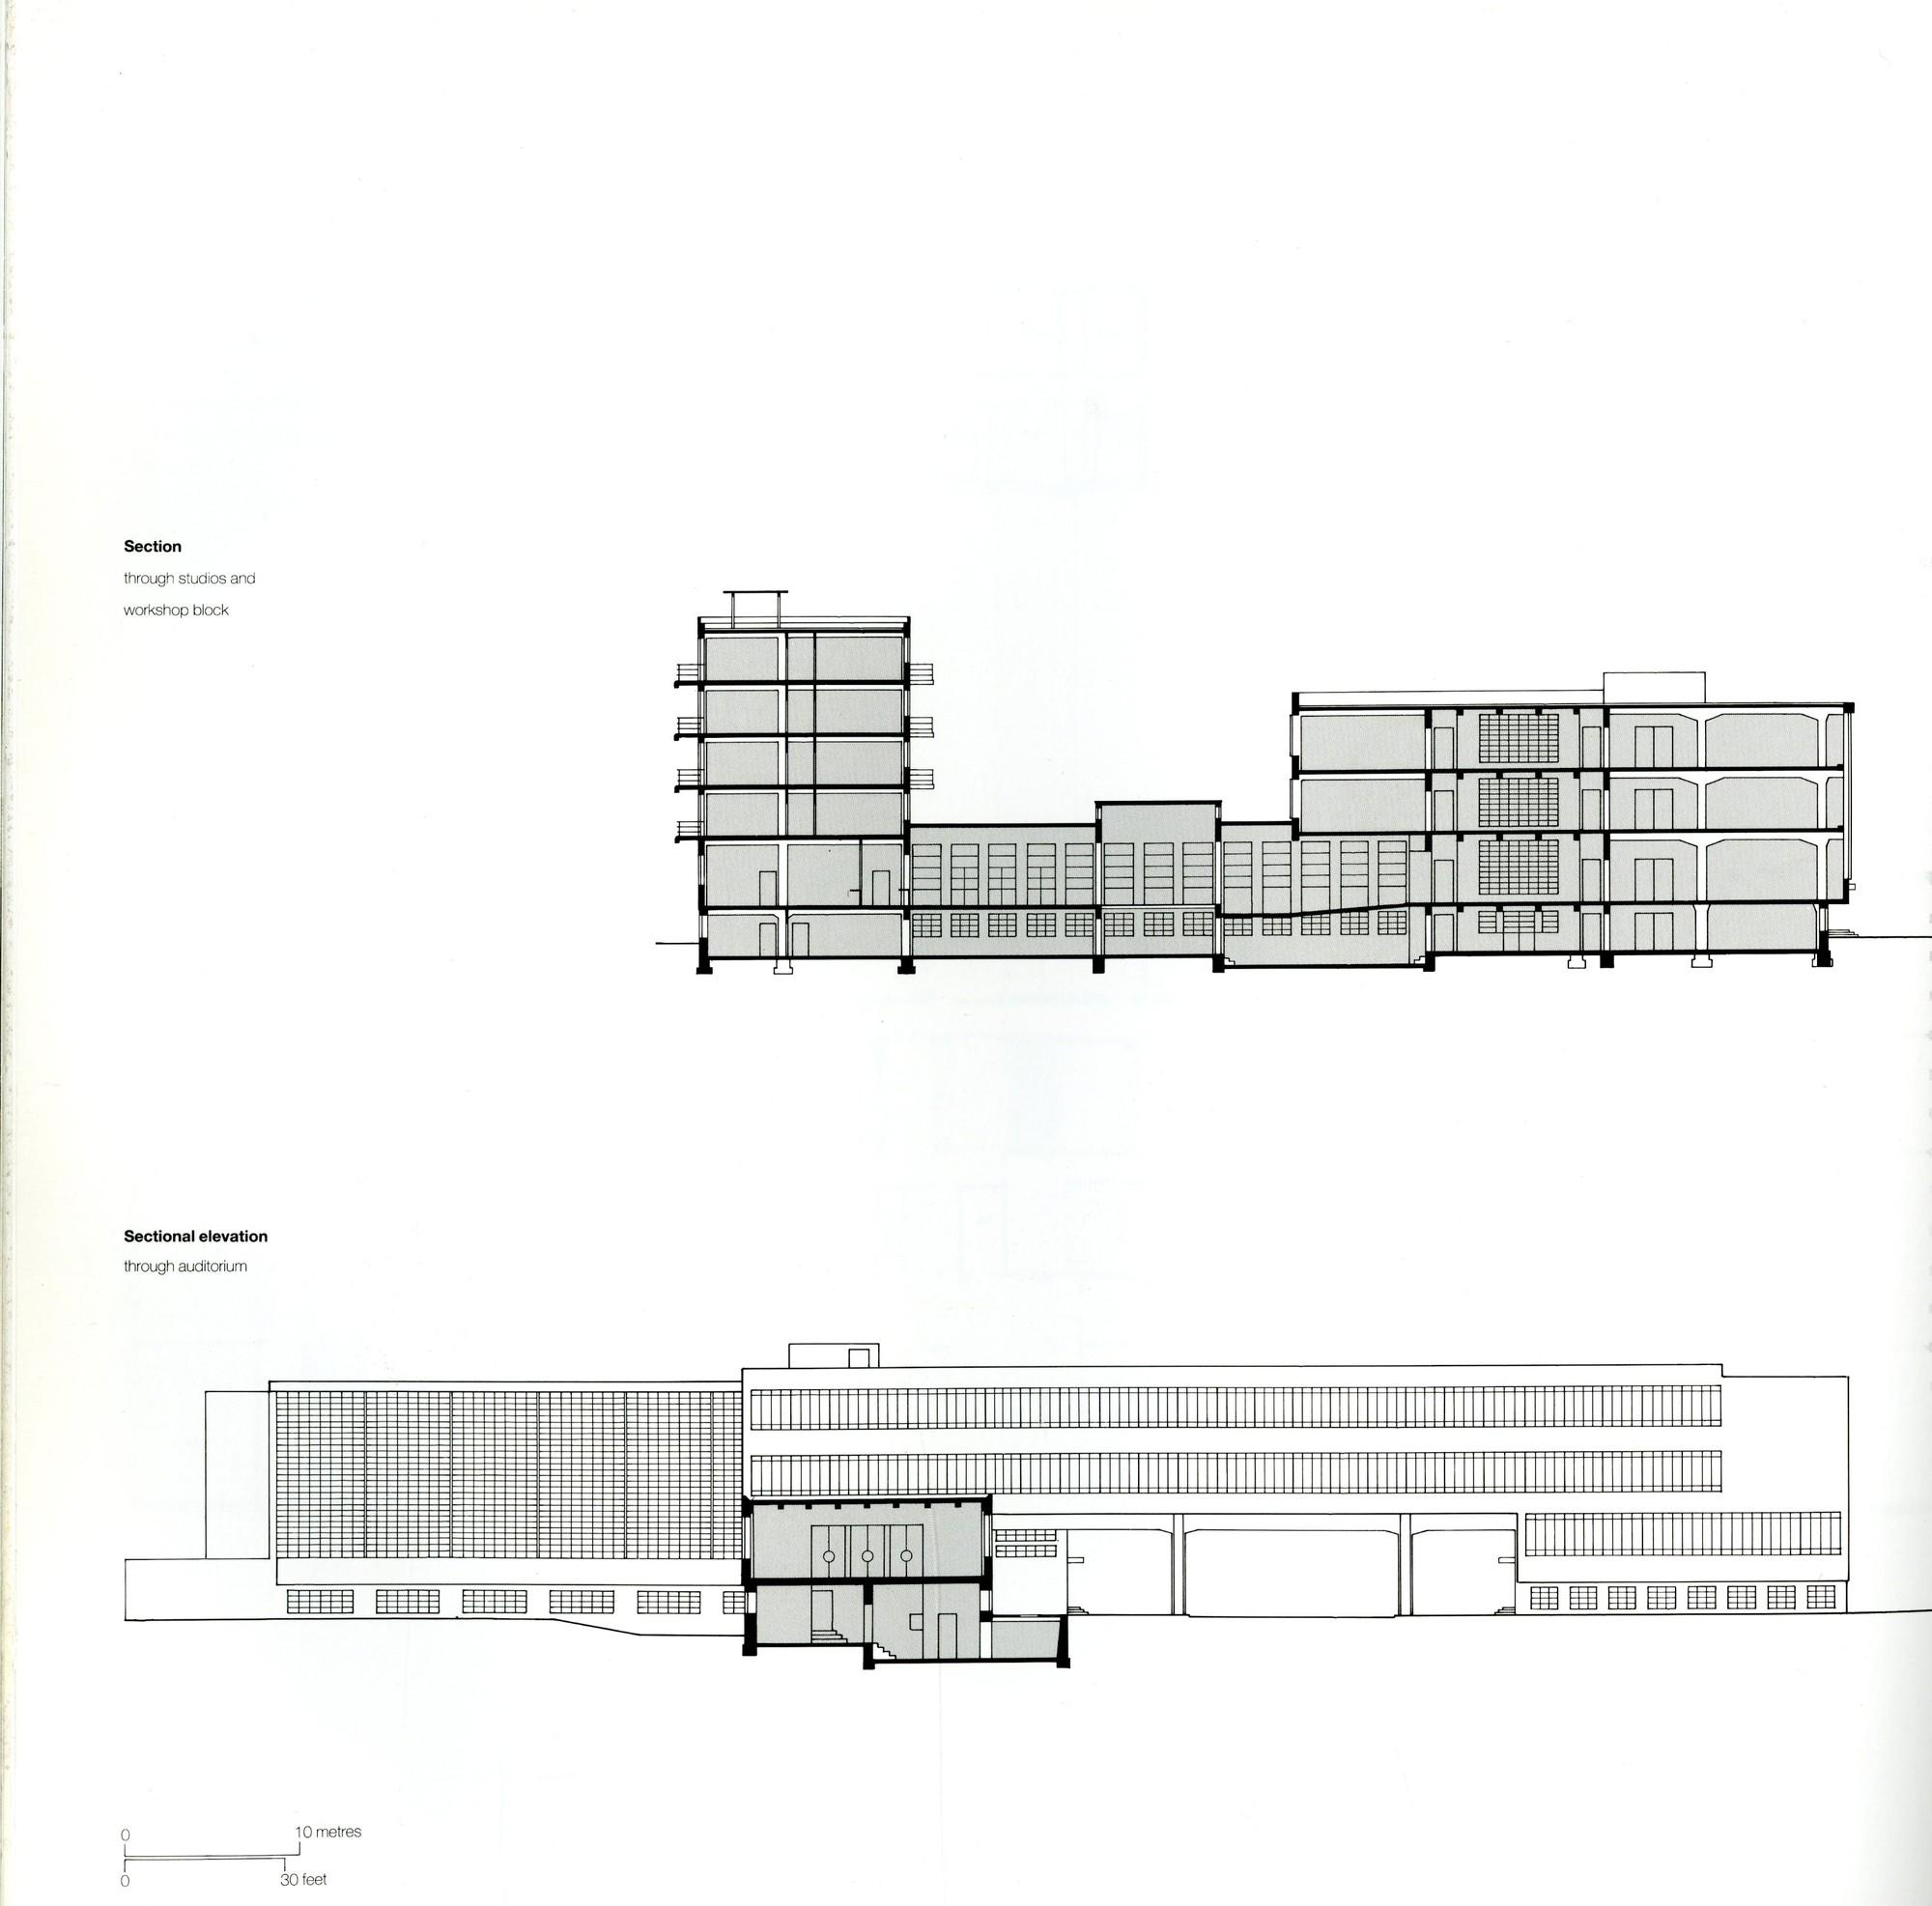 gallery of ad classics dessau bauhaus walter gropius 12. Black Bedroom Furniture Sets. Home Design Ideas